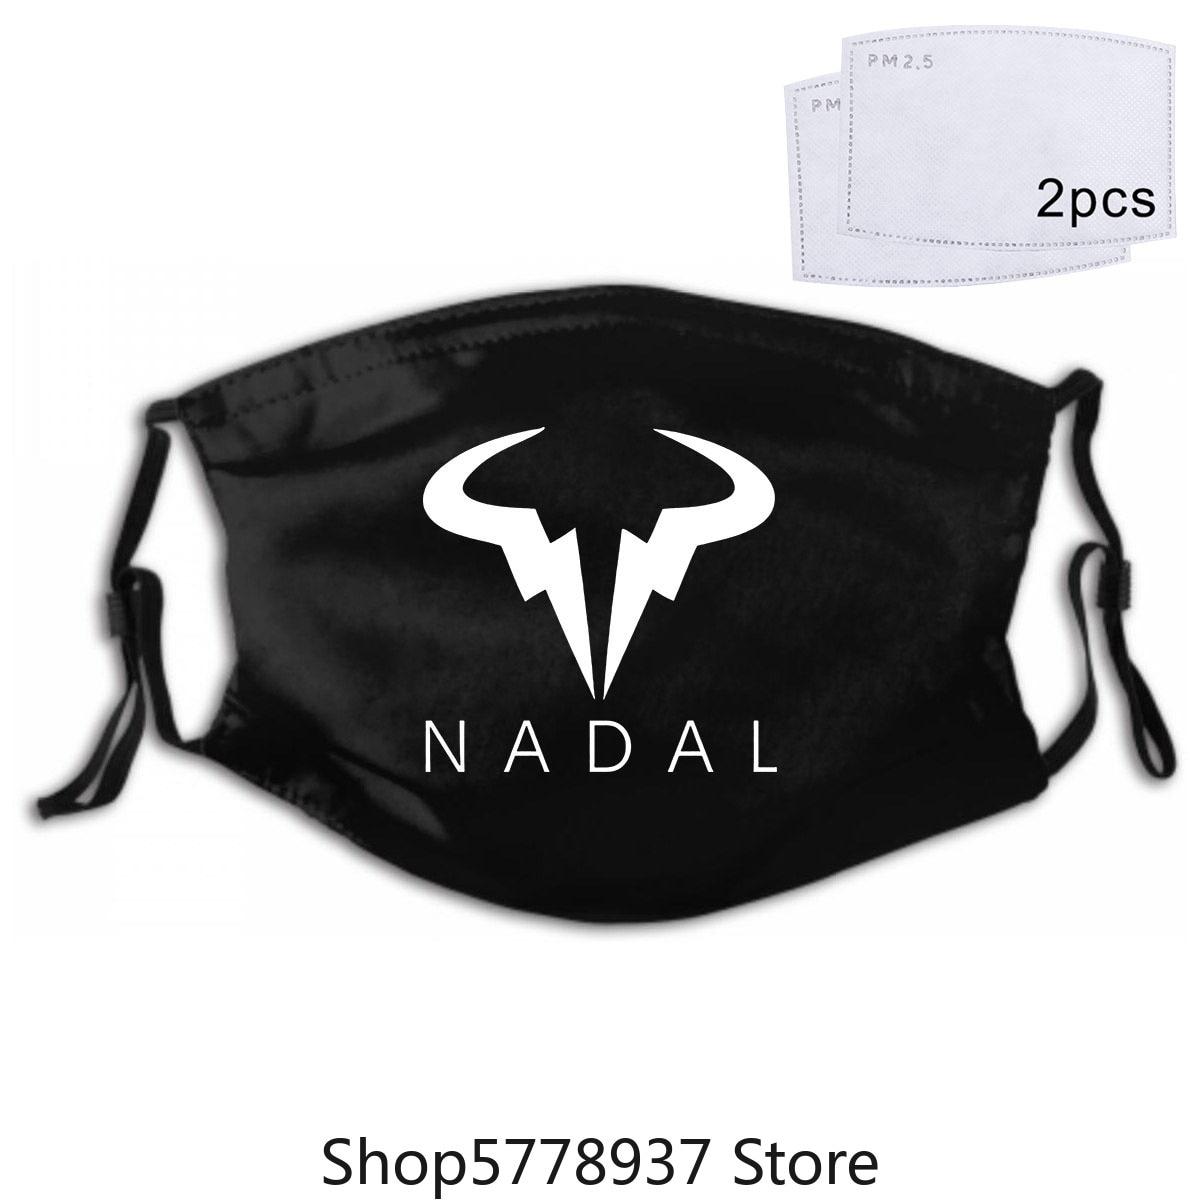 New Rafael Nadal Mask Tennis Wimbledon S 3Xl